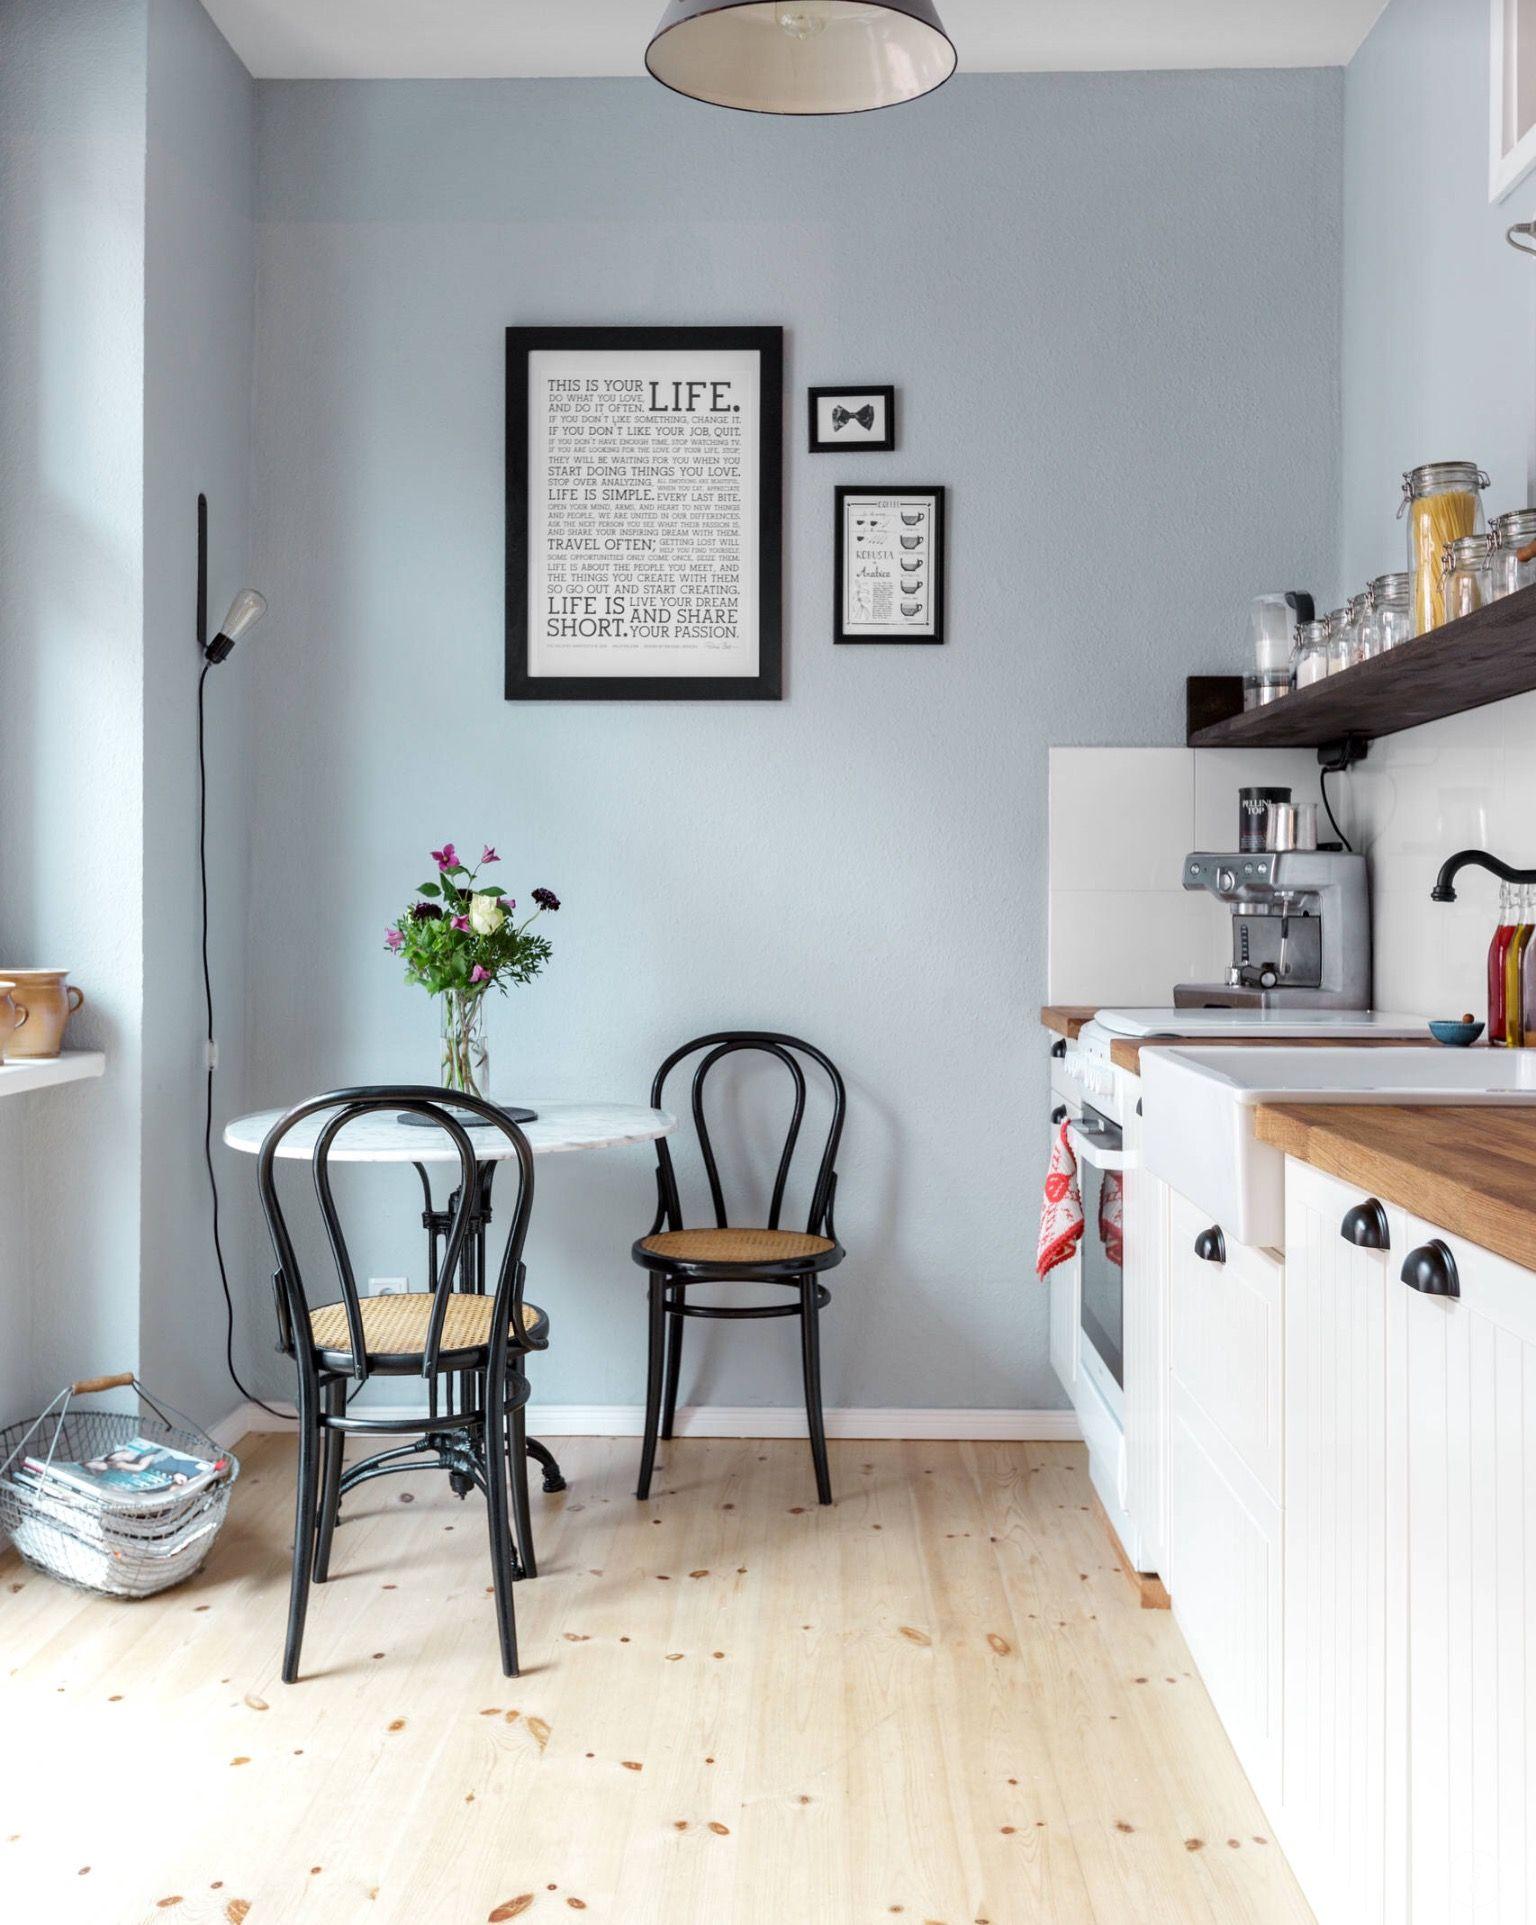 Pin by Fifi Matela on Kitchens   Pinterest   Kitchens, Kitchen ...